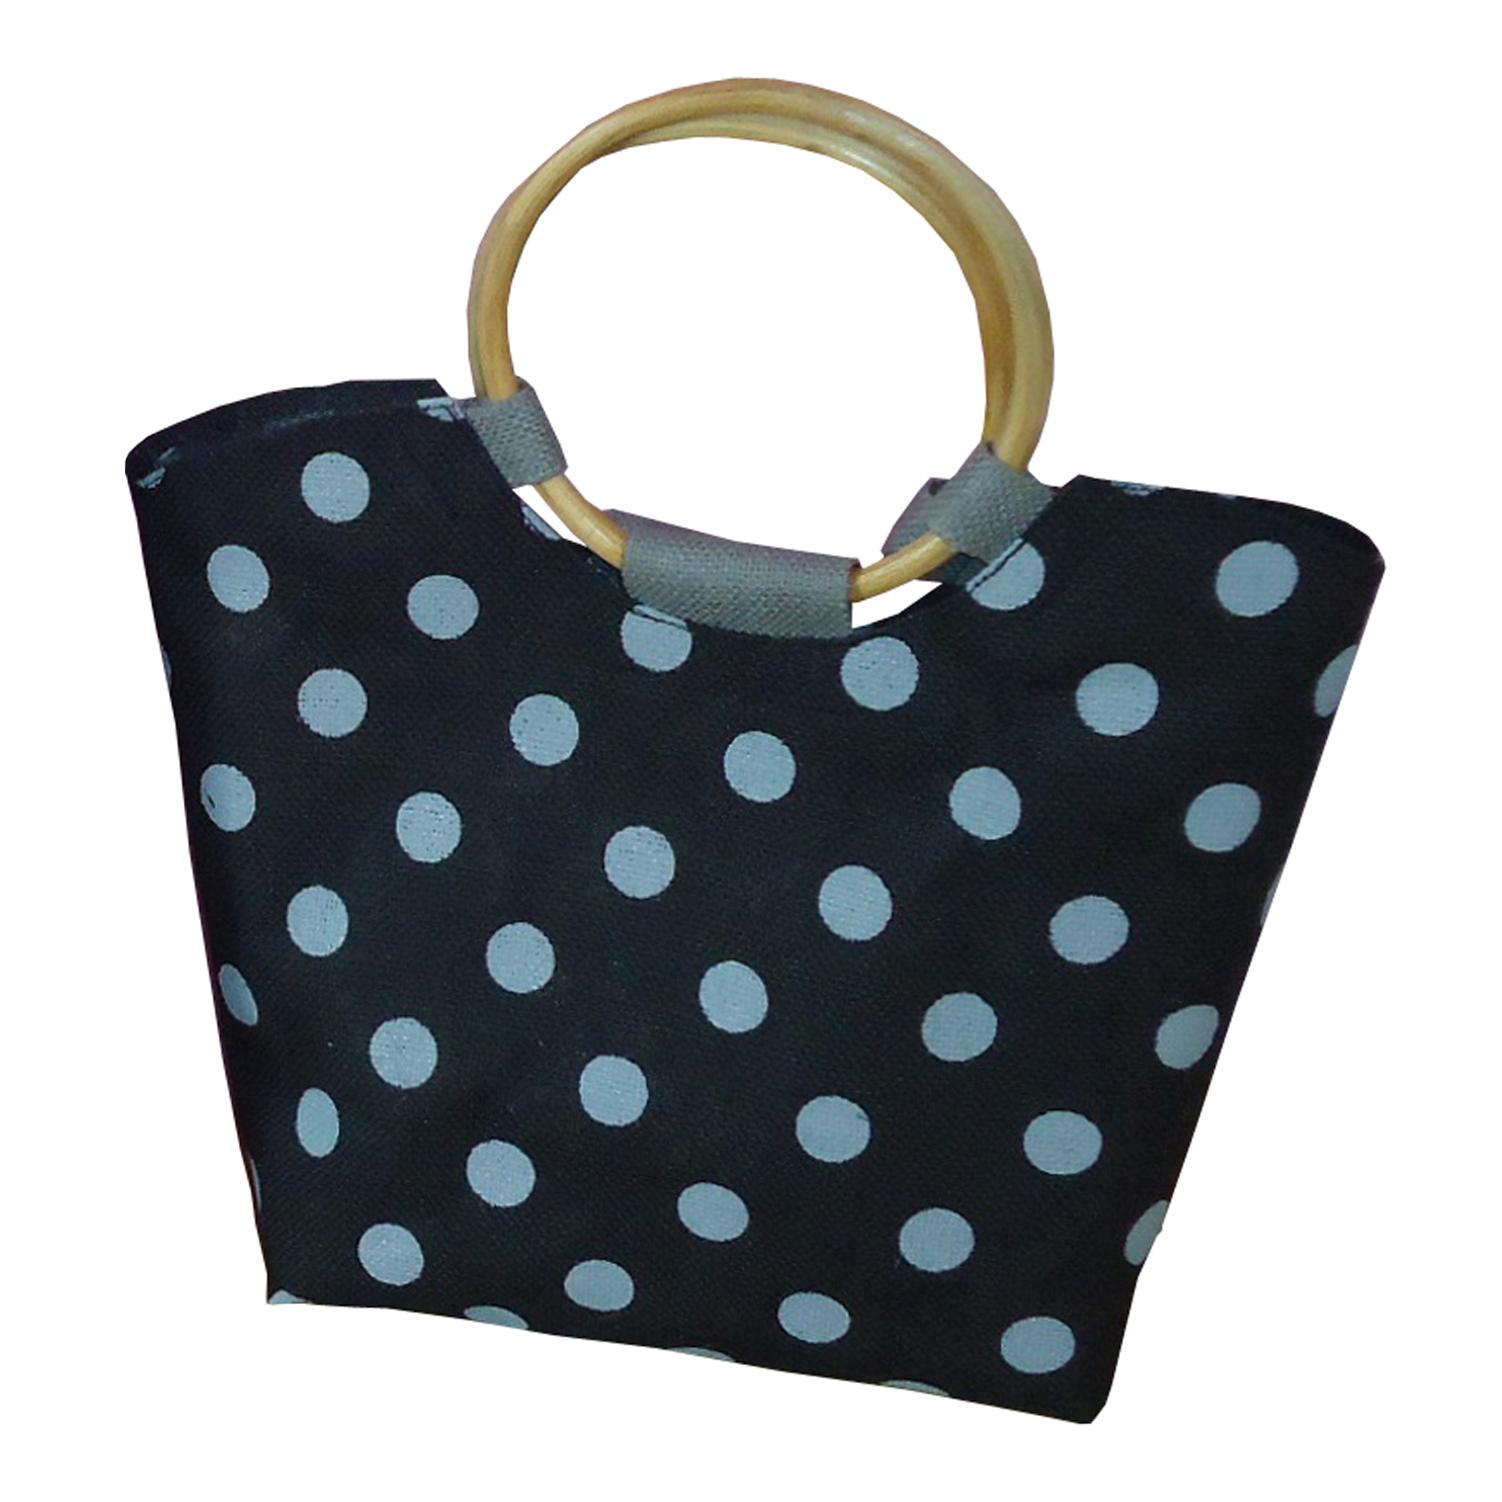 PP Laminated Jute Beach Bag With Dot Print